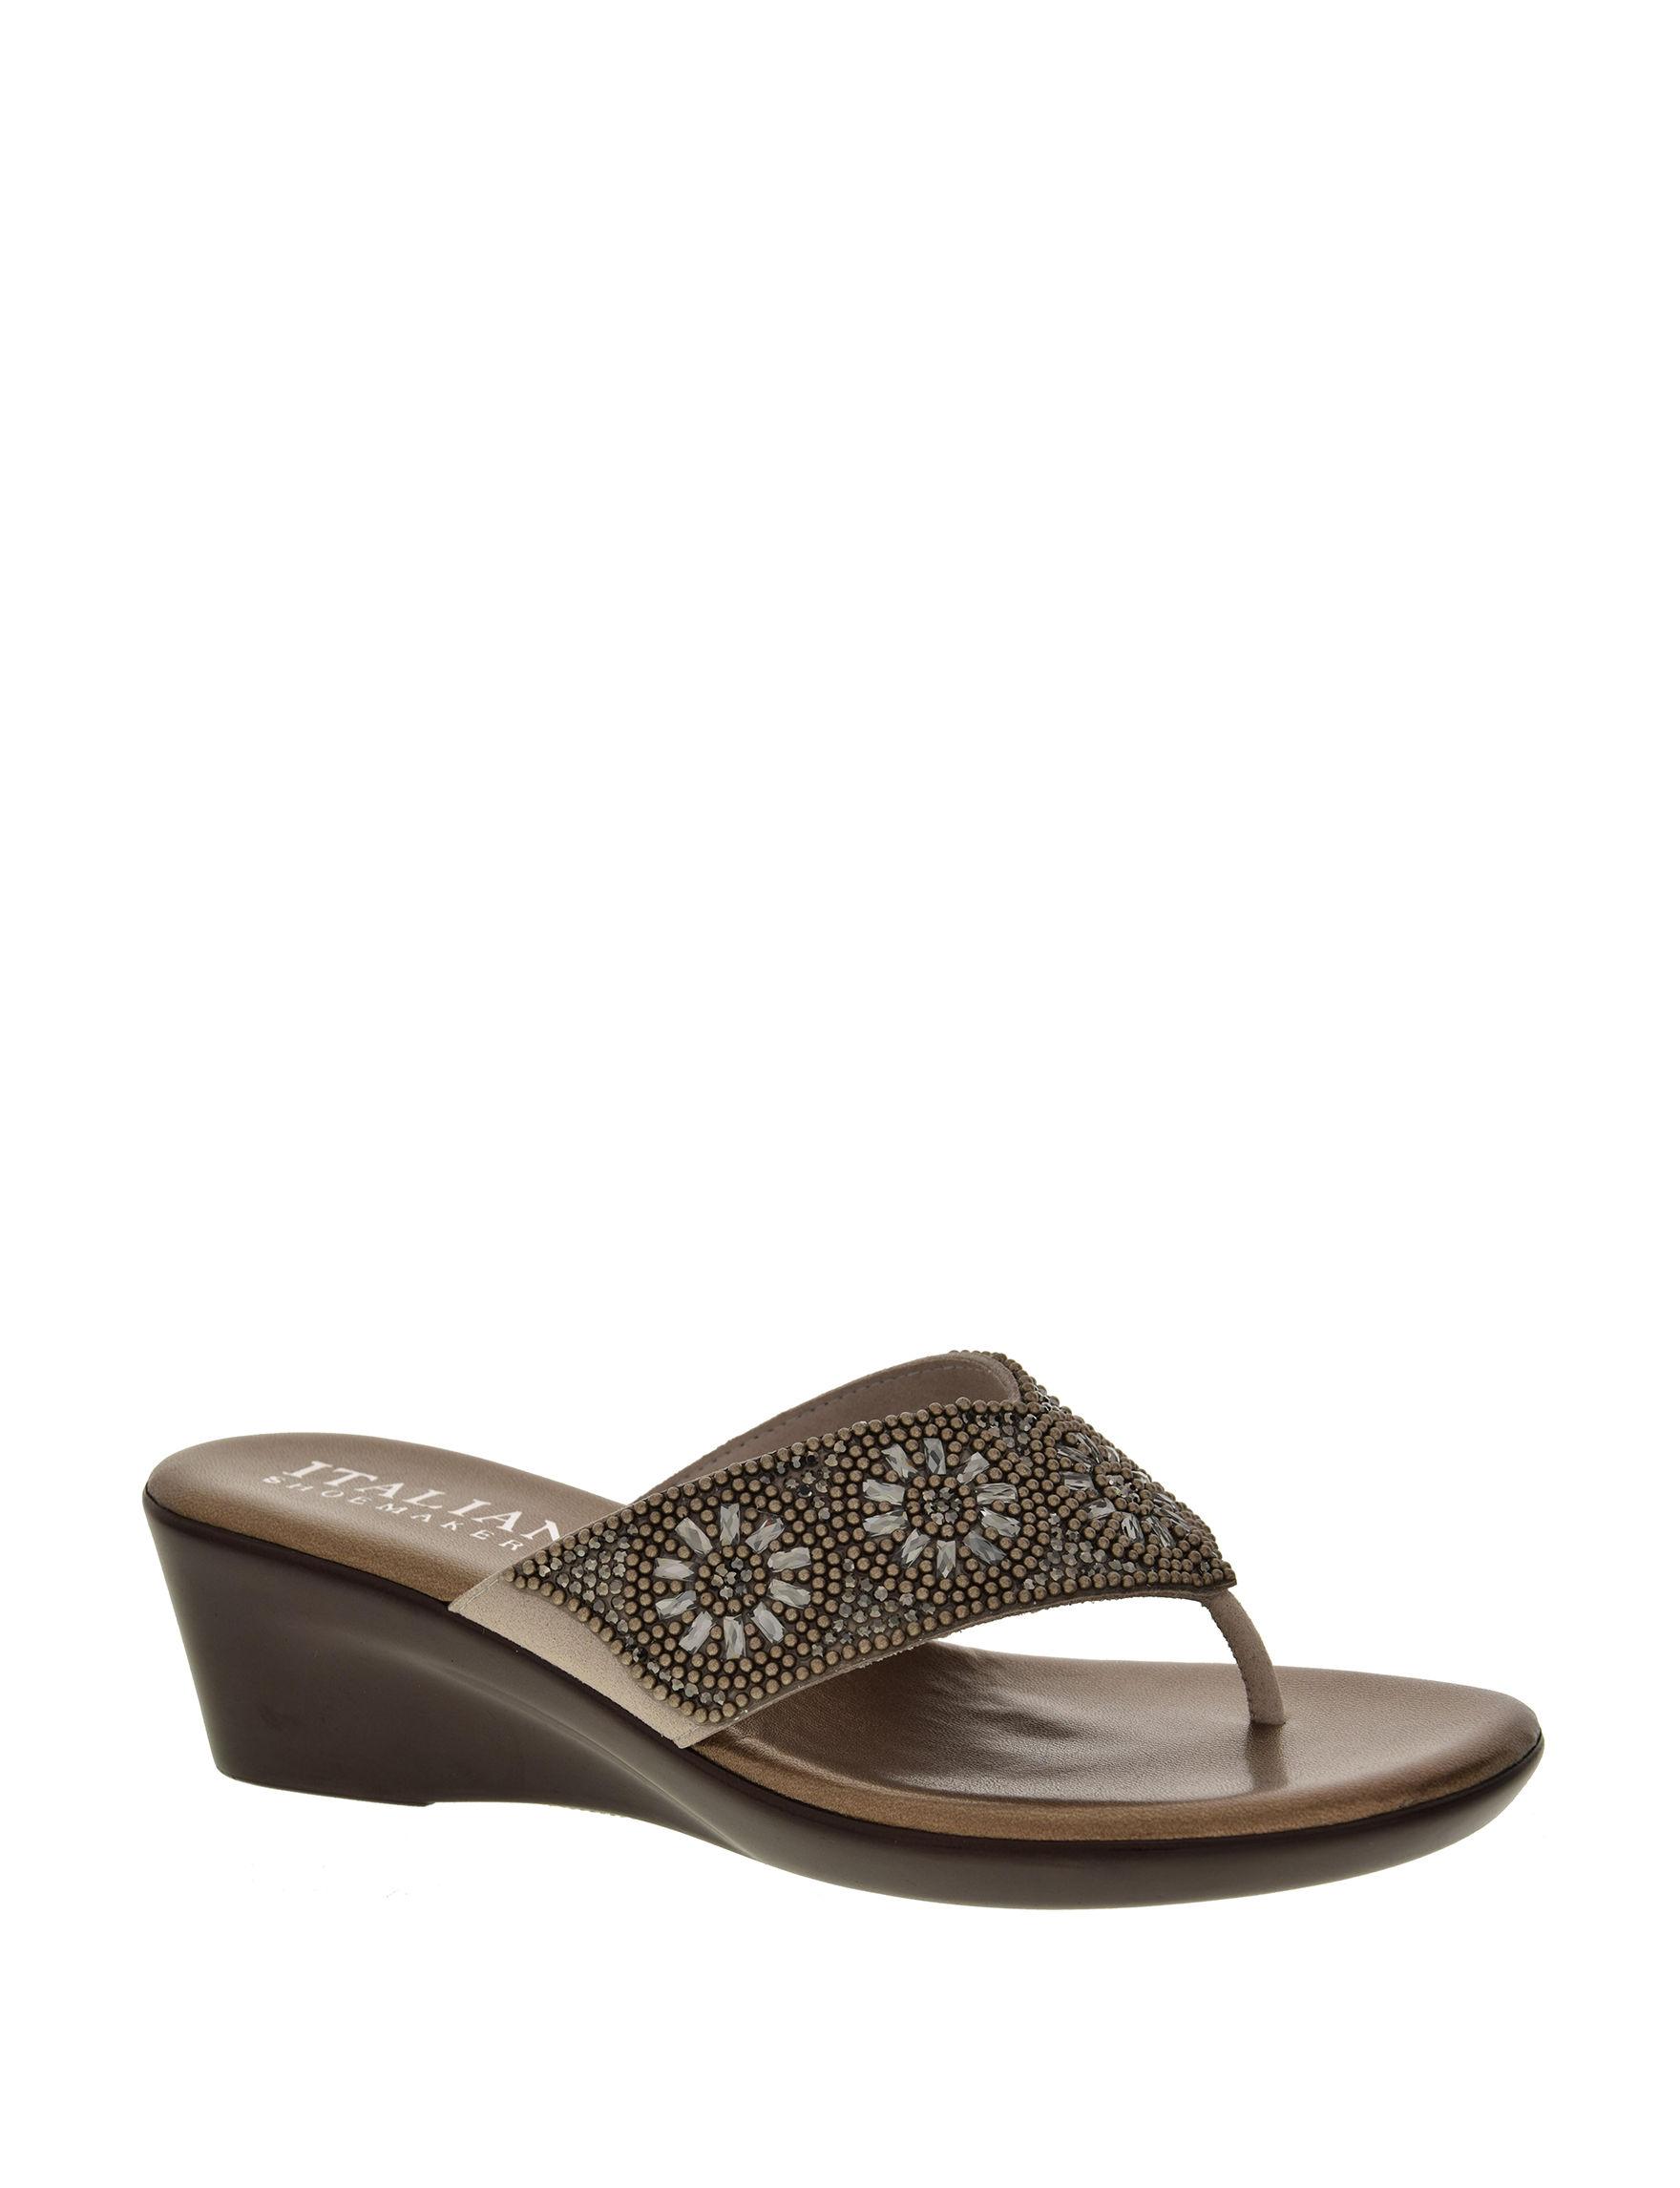 aetrex black comfort comforter blk sandals arielle womens wedge comfortable